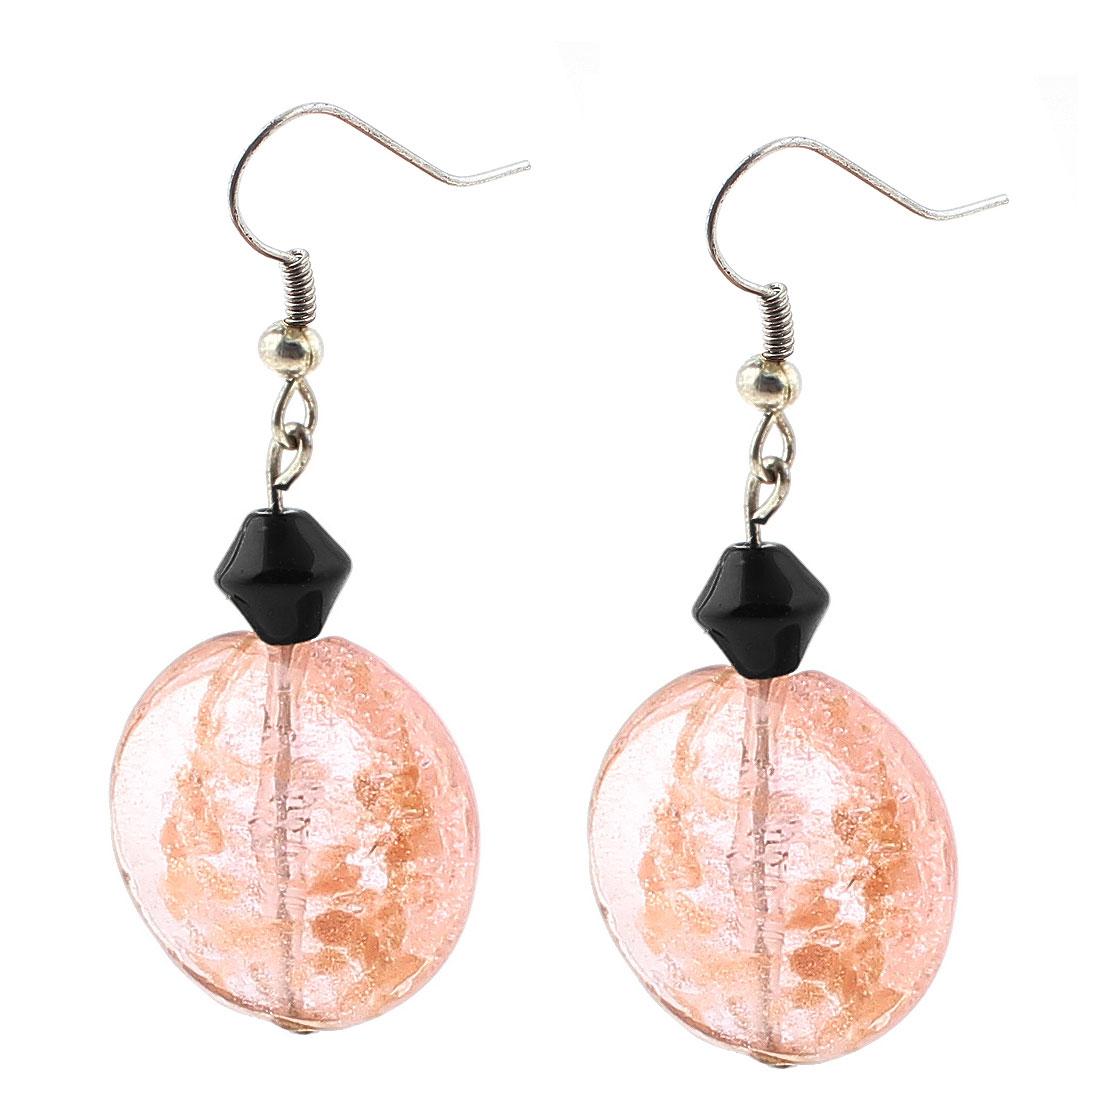 Lady Plastic Oval Rhombus Dangling Pendant Fish Hook Earrings Ornaments Pink Pair